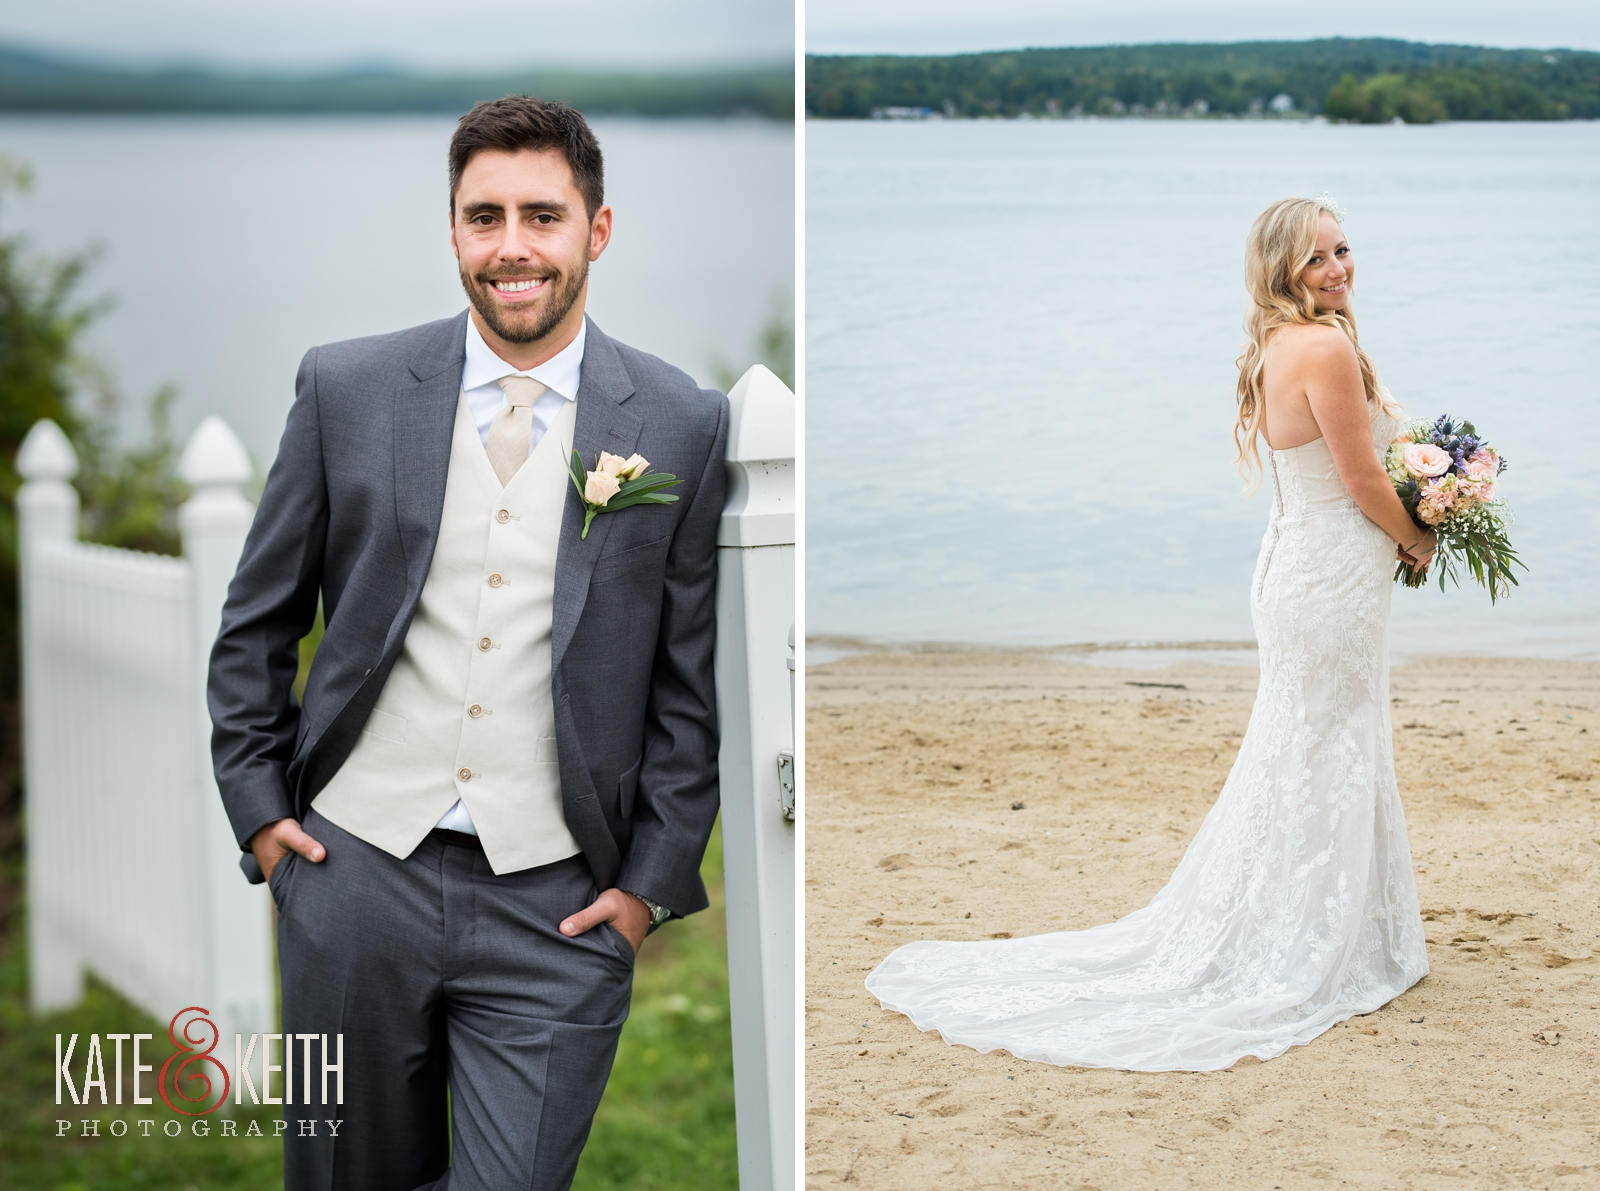 New Hampshire, Lakes Region, Lake Winnipesaukee, The Margate Resort, wedding, outdoor wedding, lakeside wedding, portraits, wedding portraits, bride and groom, bridal portraits, groom portraits, bridal party